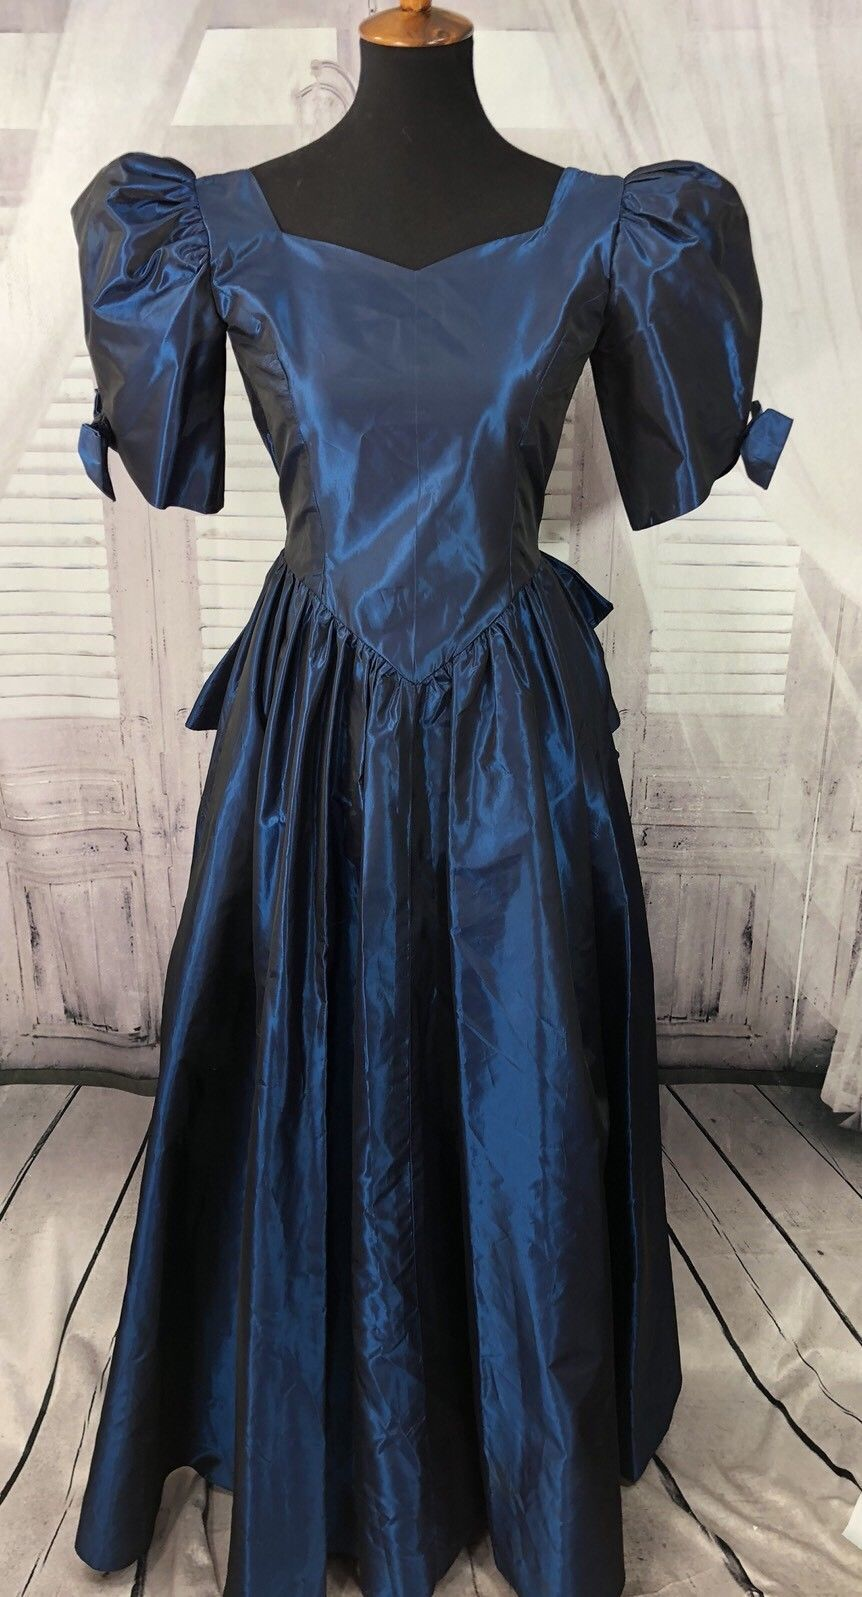 66e0a9c9e30c Vtg 80s prom dress Blue taffeta Puff bow Sleeve ruffle formal ugly Bustle 0  2 ❤W   eBay